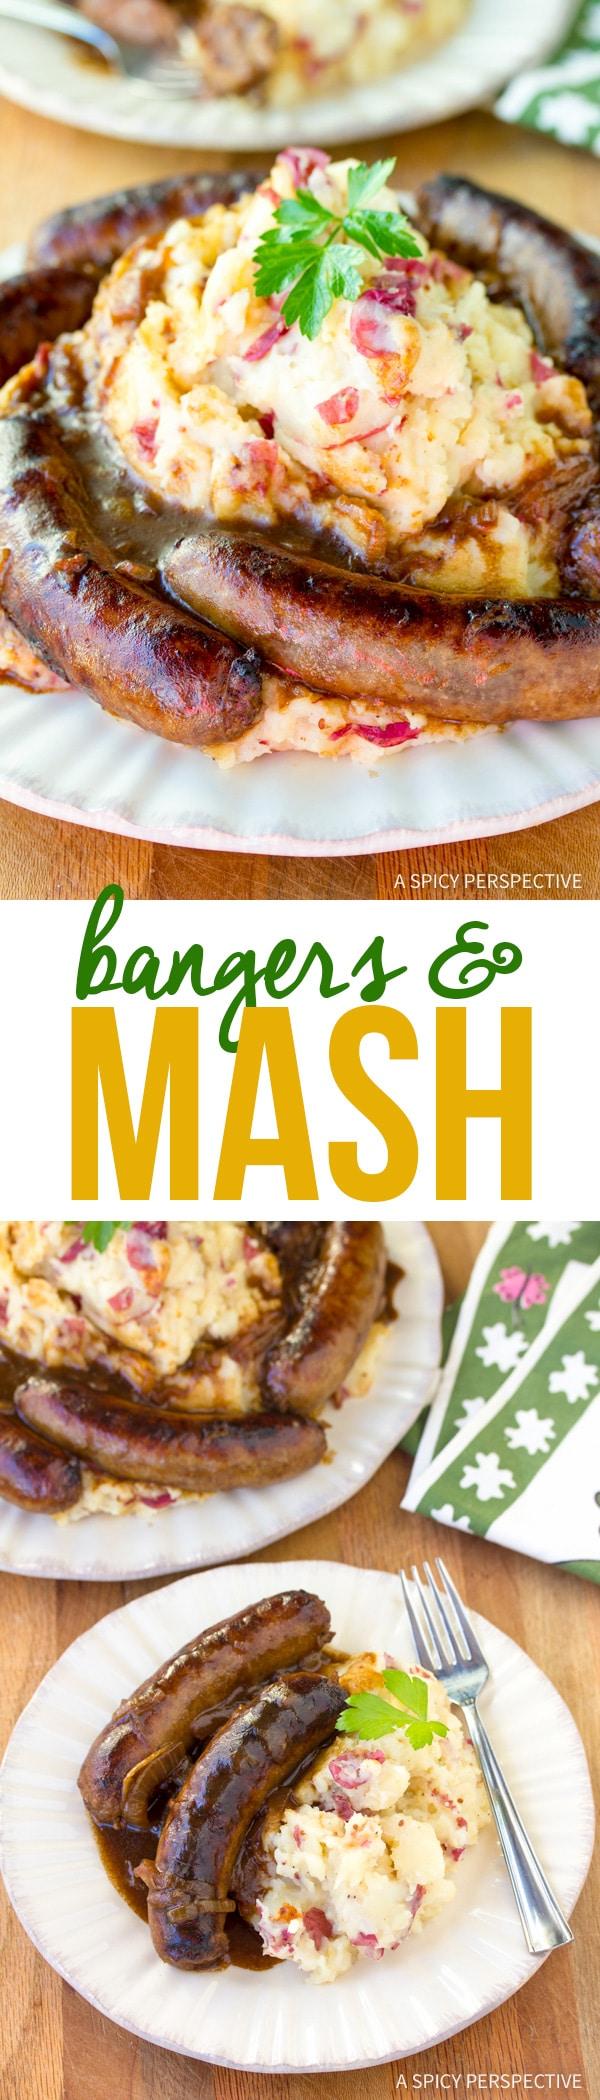 Rustic Bangers and Mash Recipe #saintpatricksday